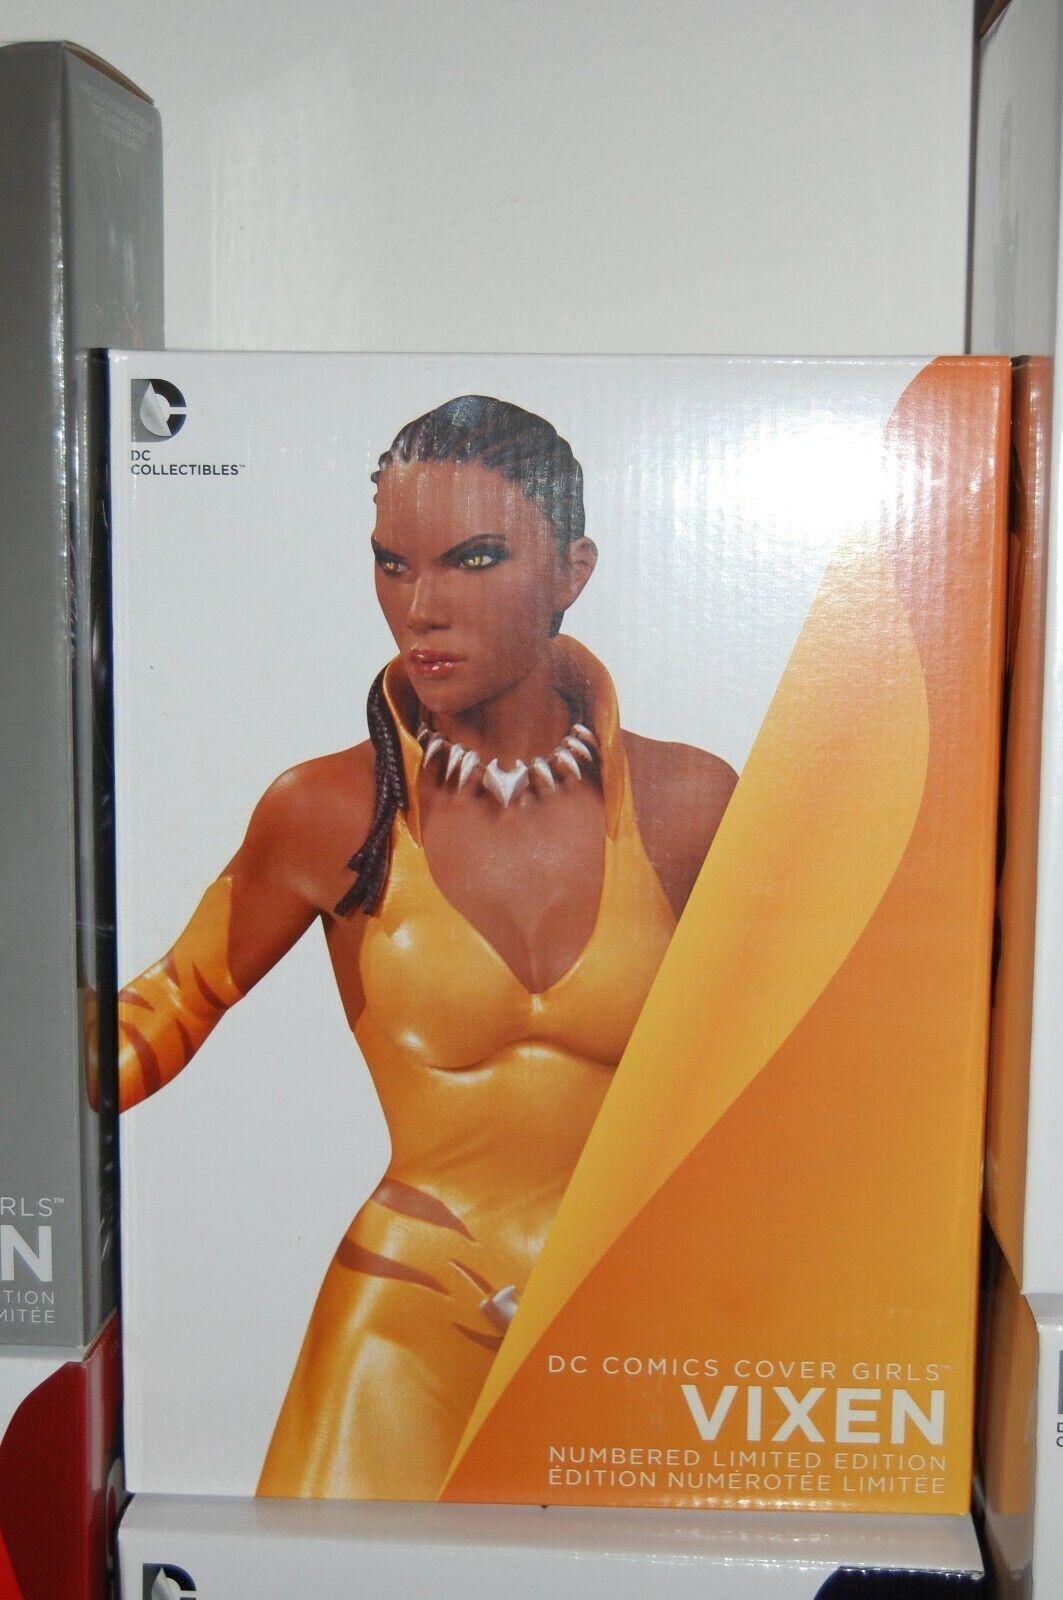 DC COMICS COVER GIRLS STATUE VIXEN NO WONDER WOMAN WOMAN WOMAN BATMAN SUPERMAN JOKER FLASH 4ad8bb